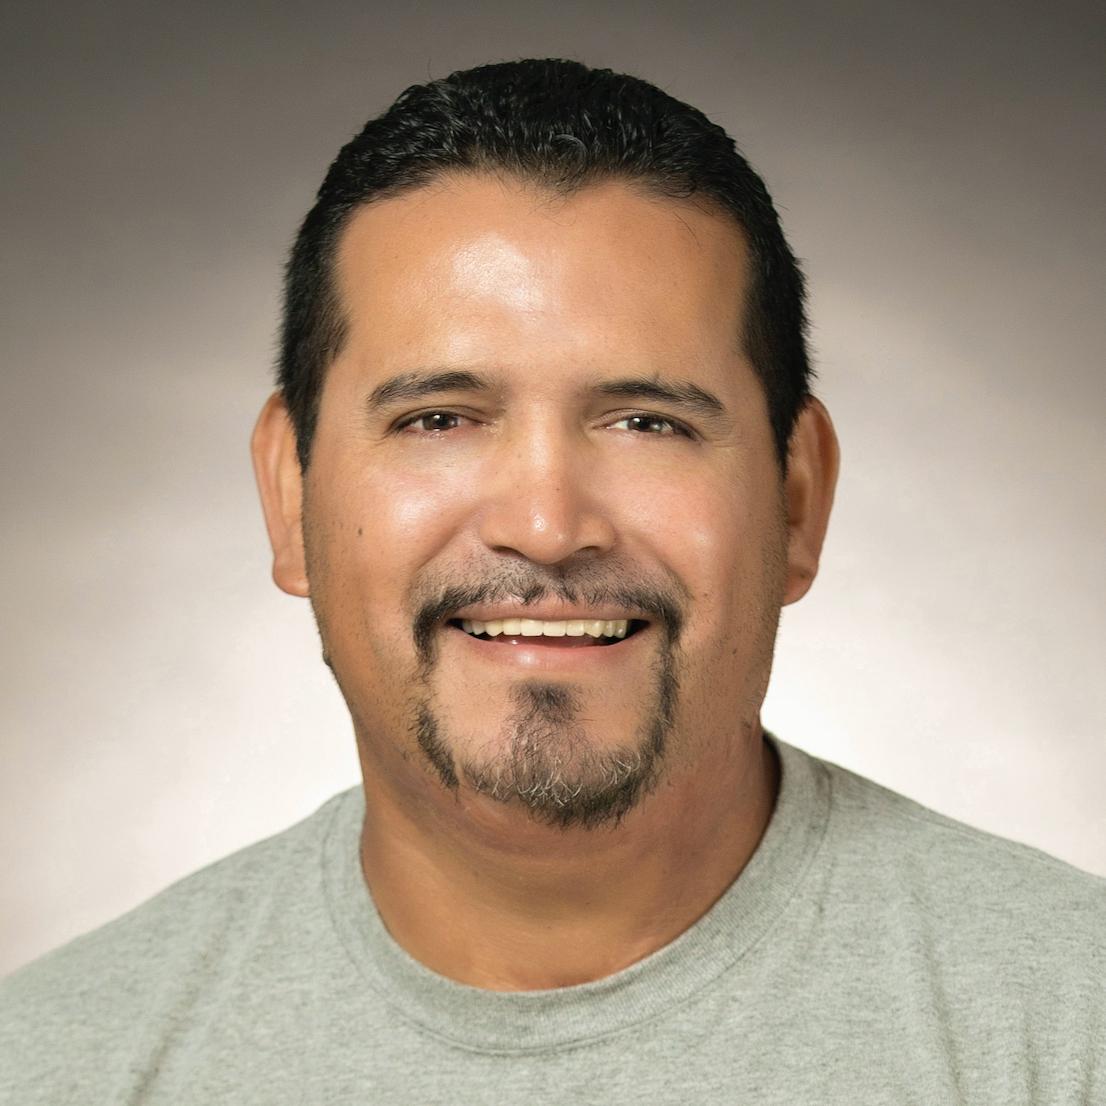 Photo of Selvin Estrada, Lead Maintenance